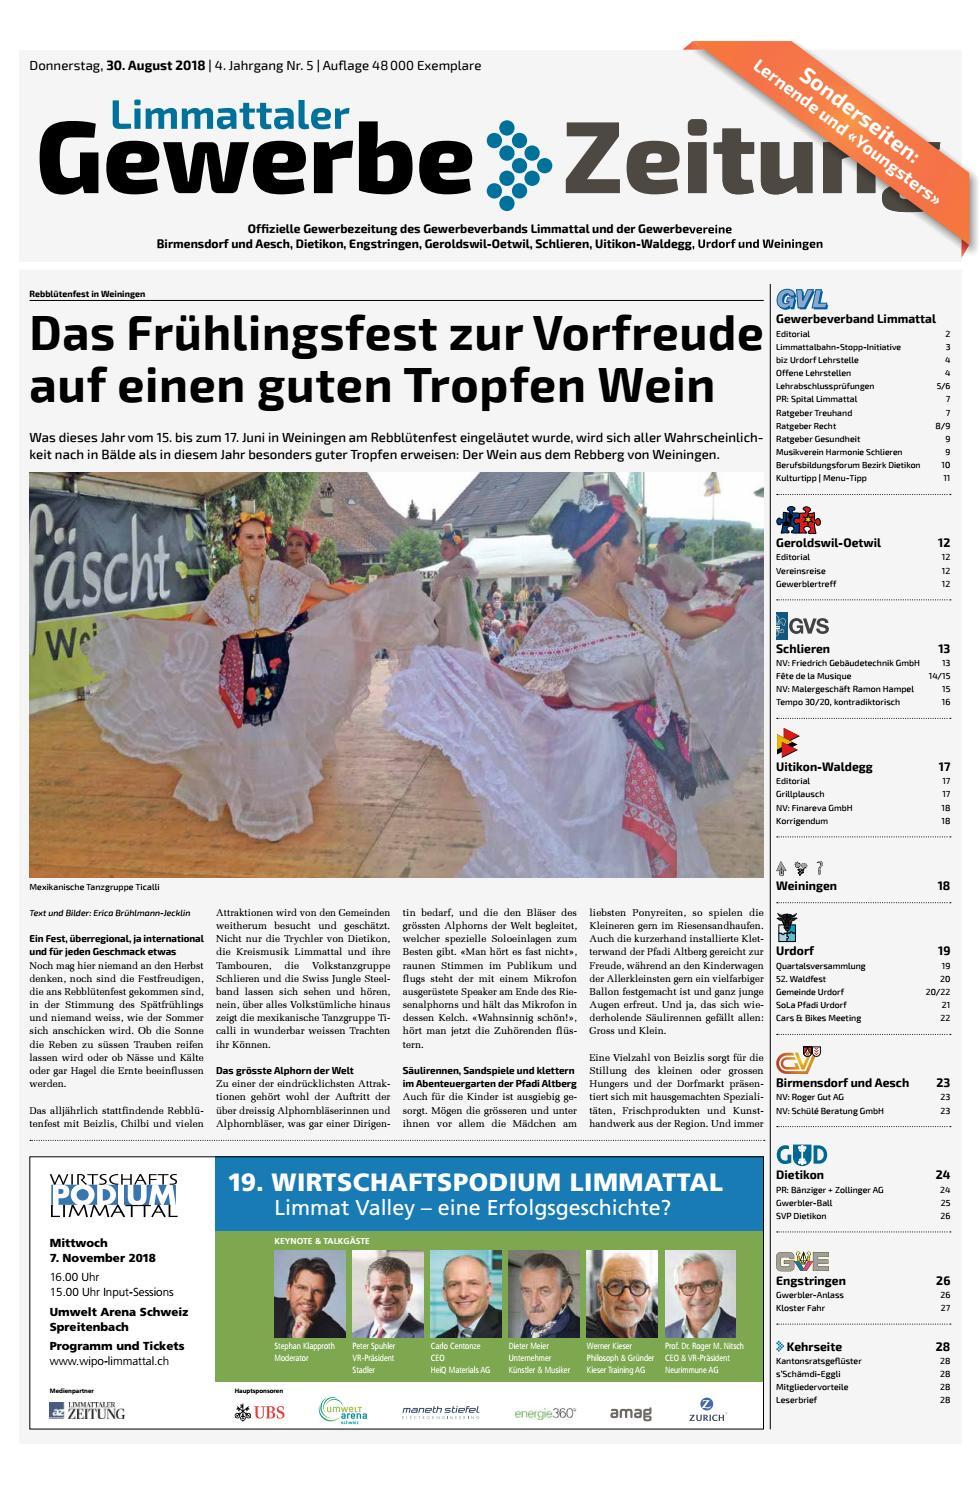 Dietikon Online: Anlsse - Stadt Dietikon